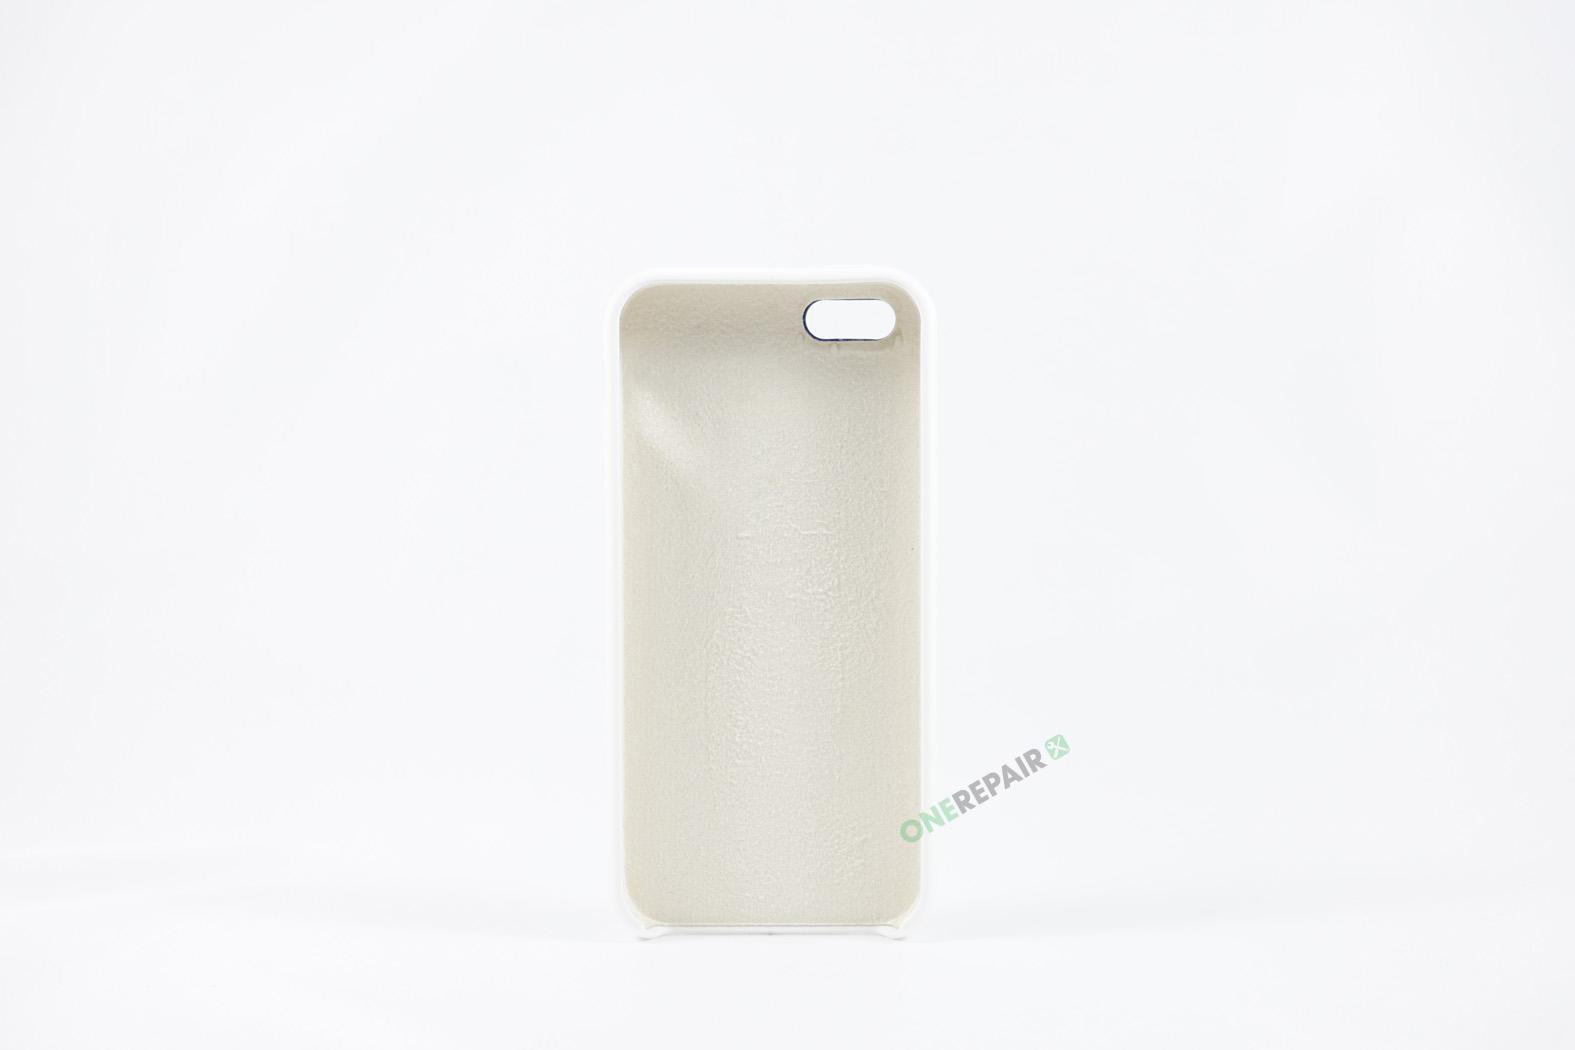 350484_iPhone_5_5S_SE_Silikone_Cover_Hvid_OneRepair_WM_00003